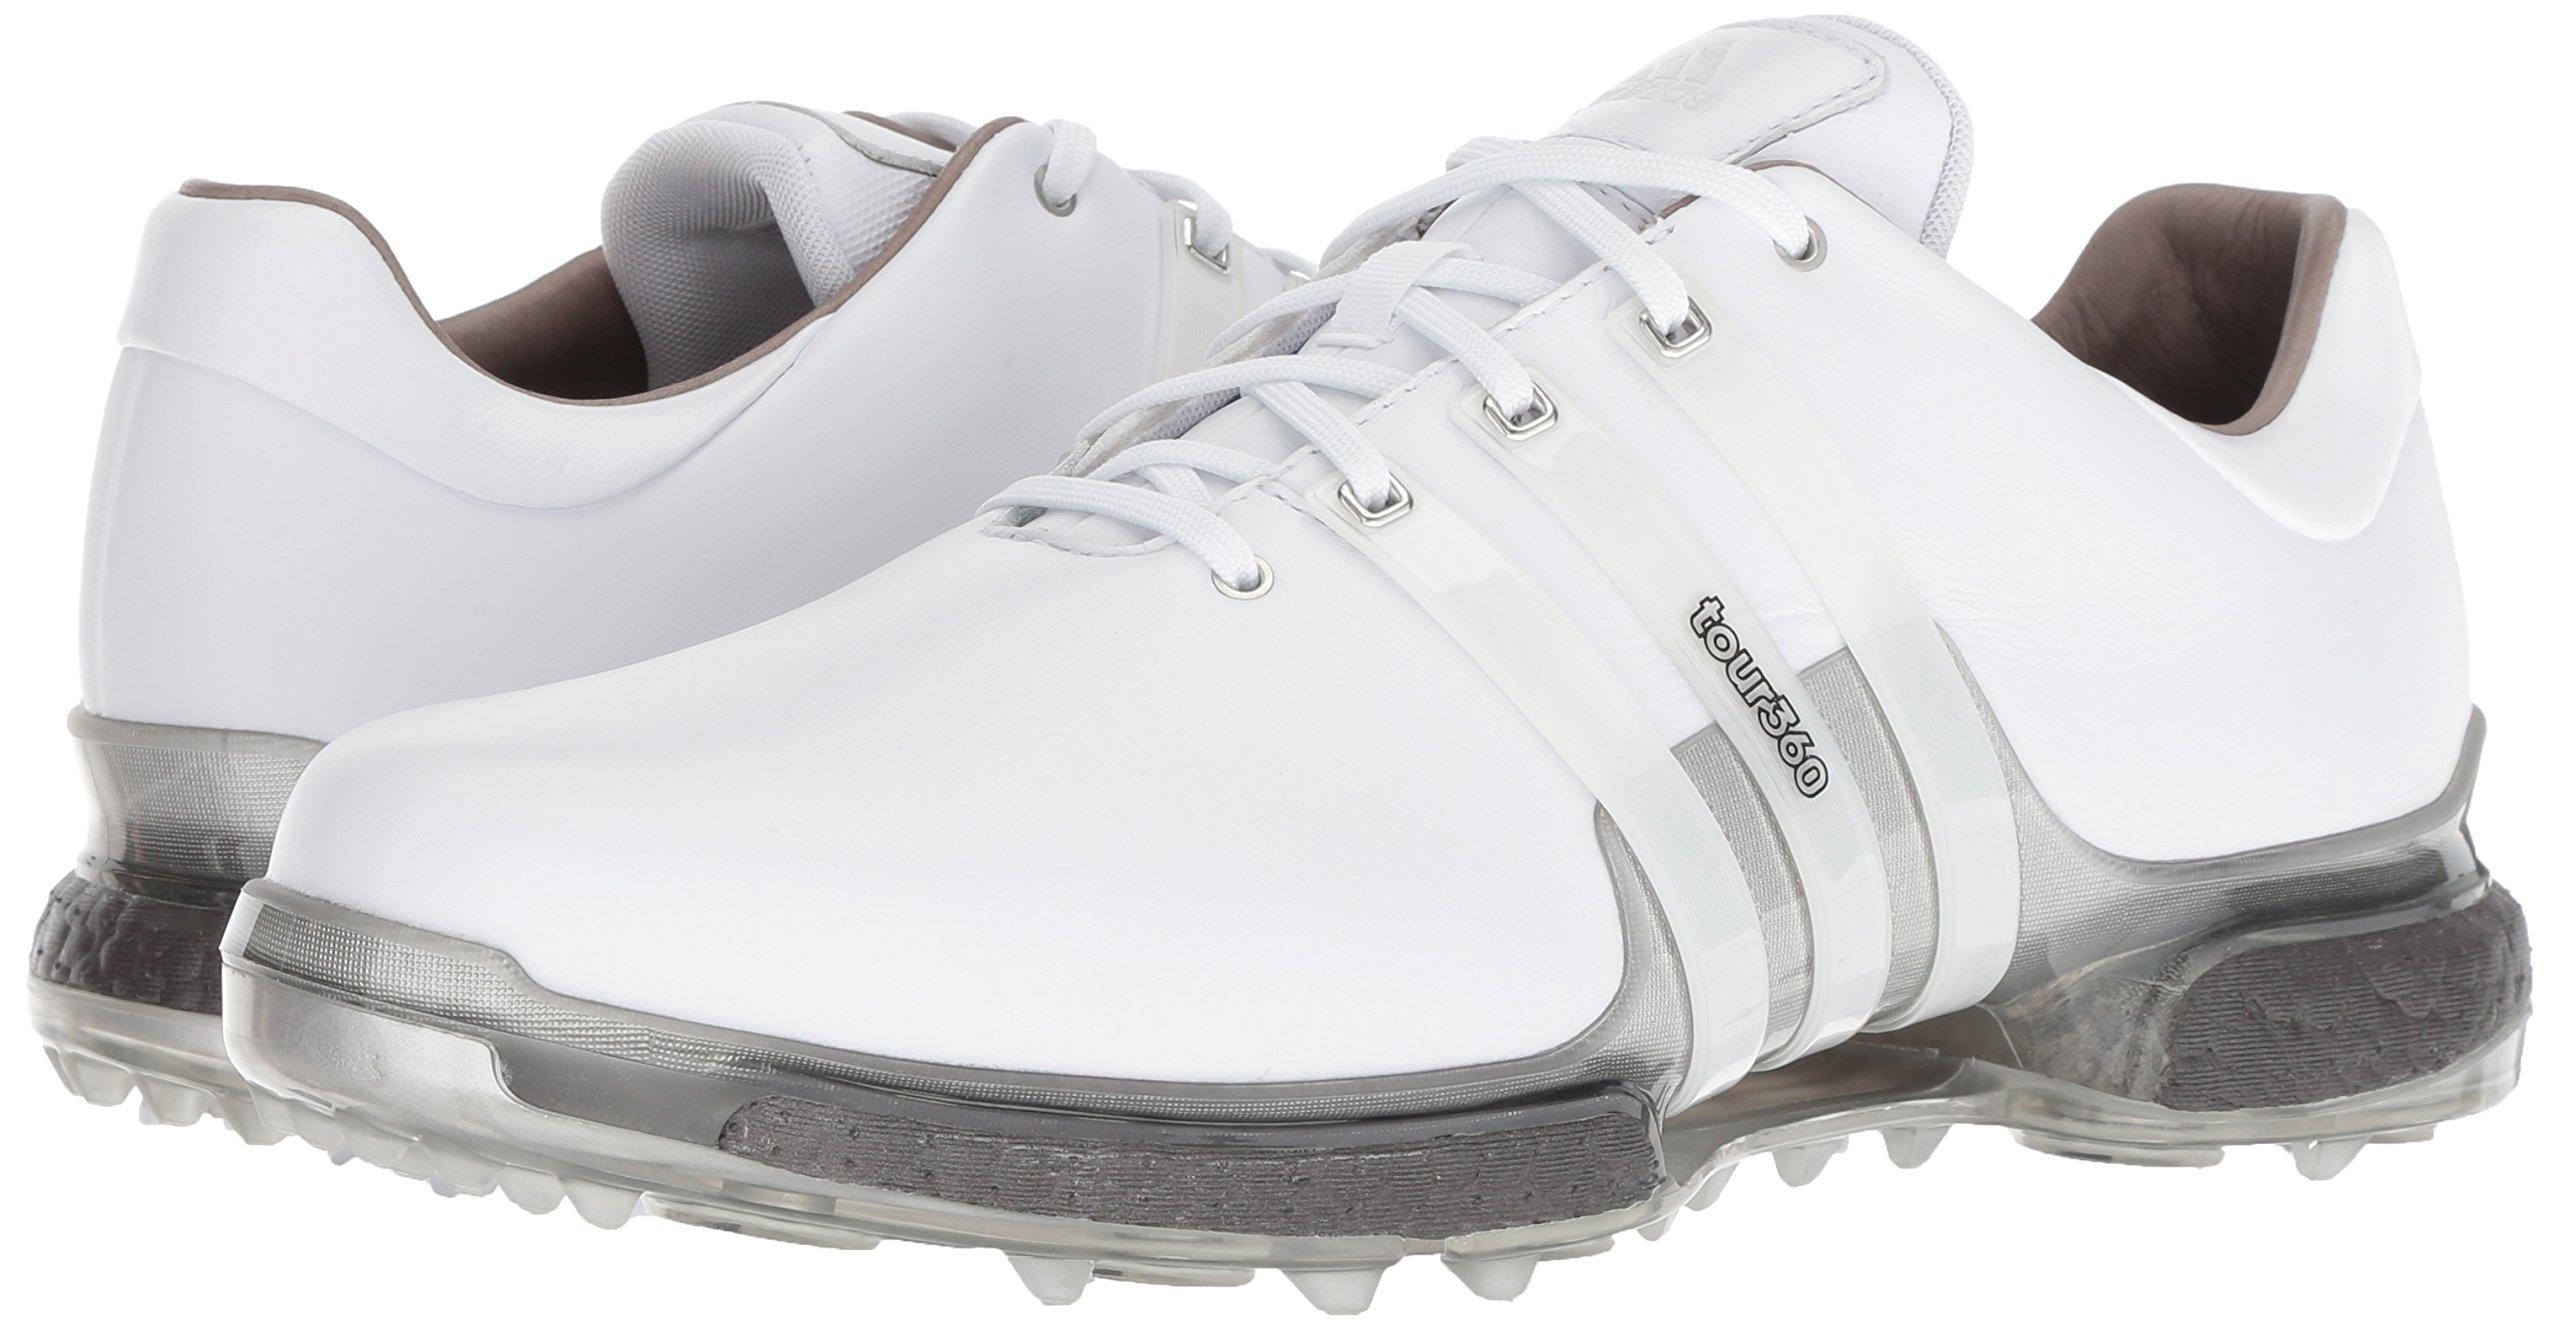 adidas Men's Tour 360 Boost 2.0 Golf